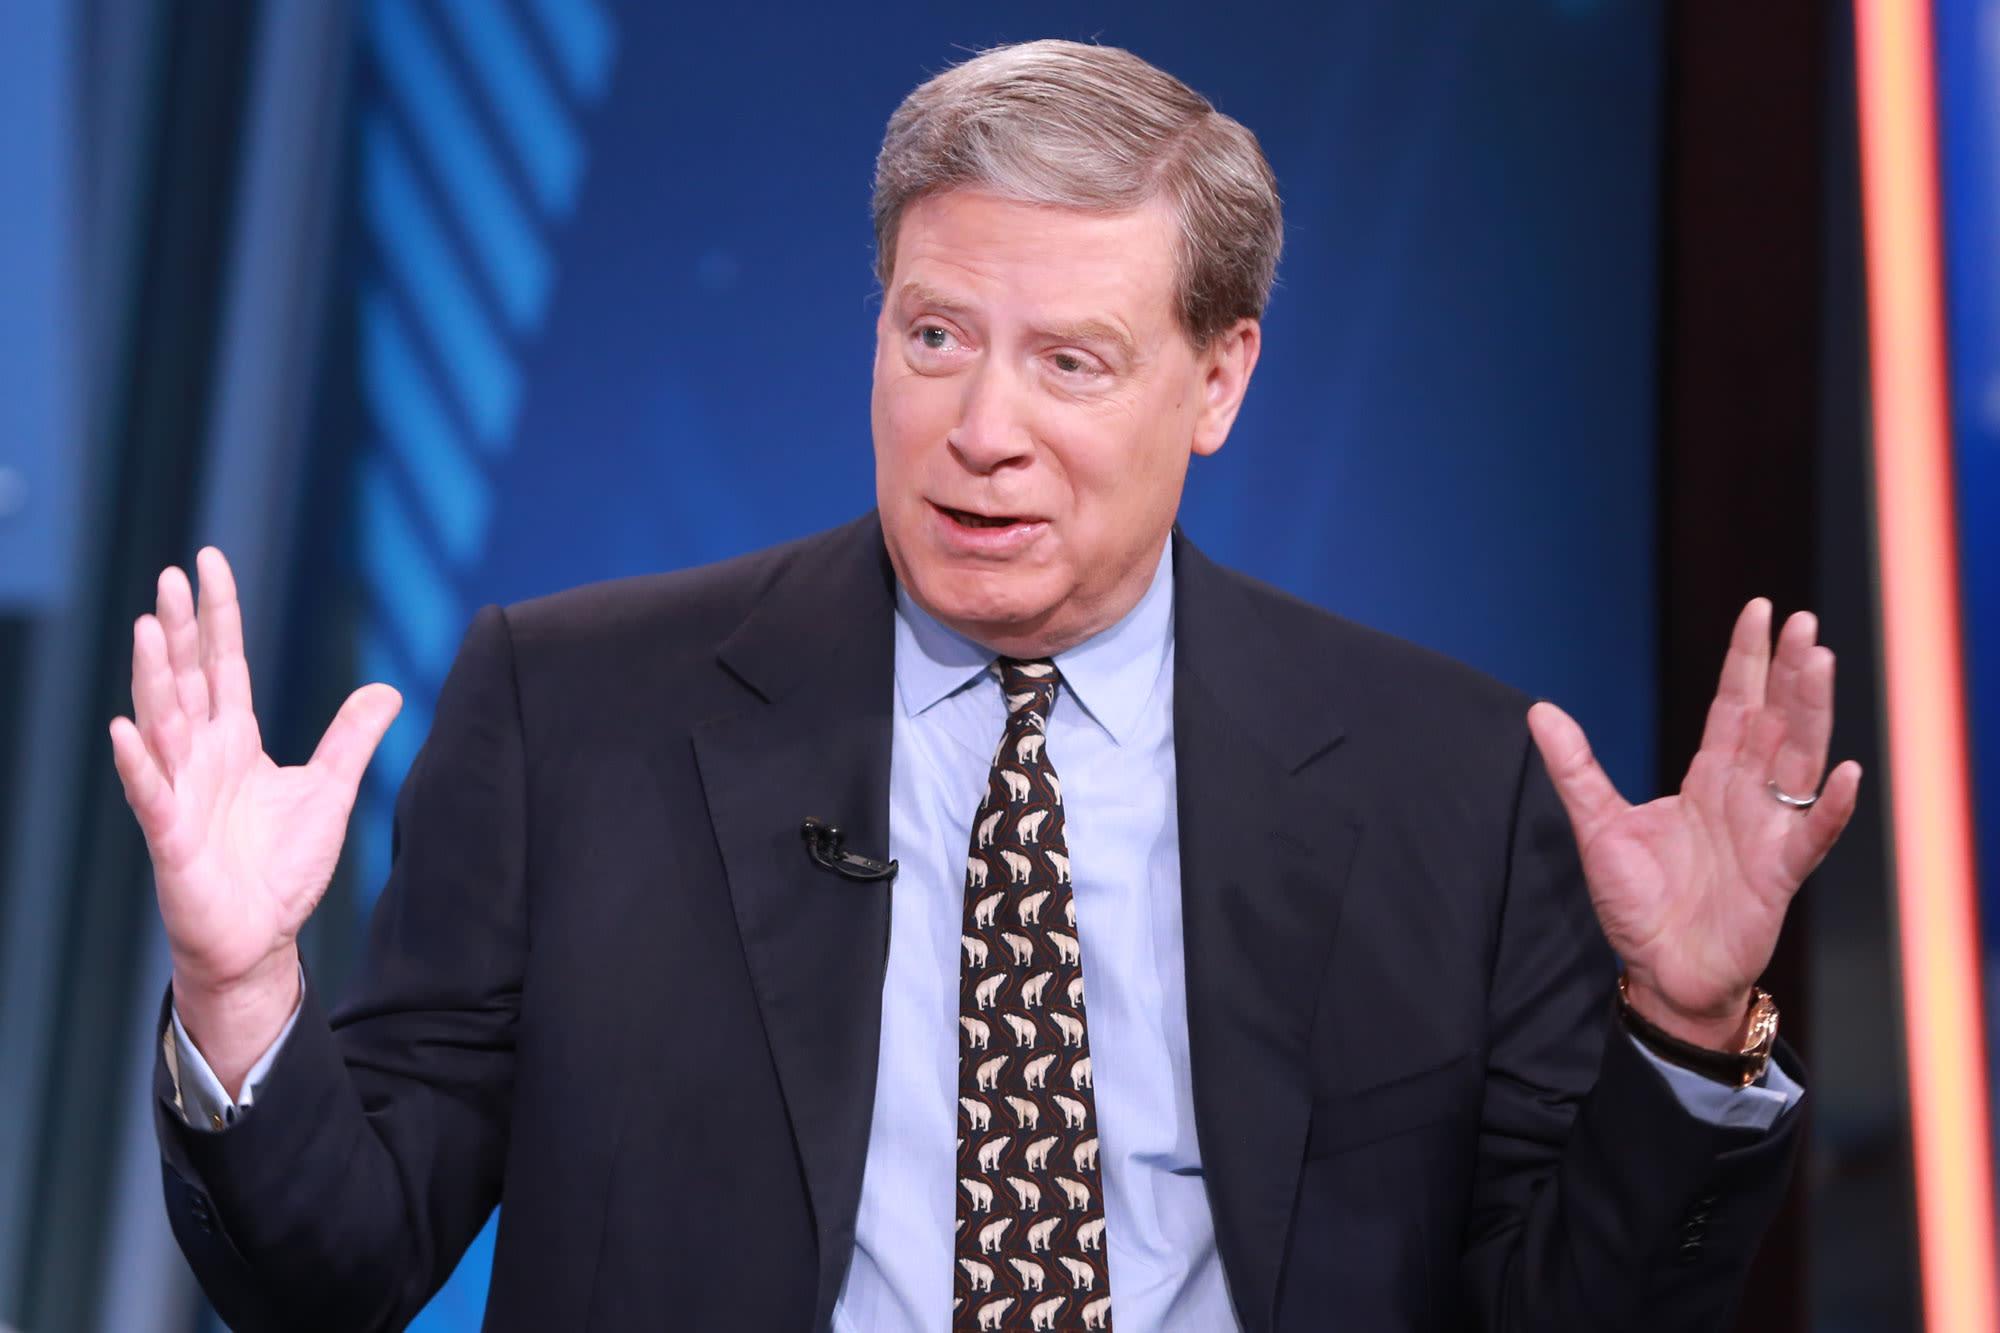 Stanley Druckenmiller fears tariffs could kill the market's 'animal spirits'